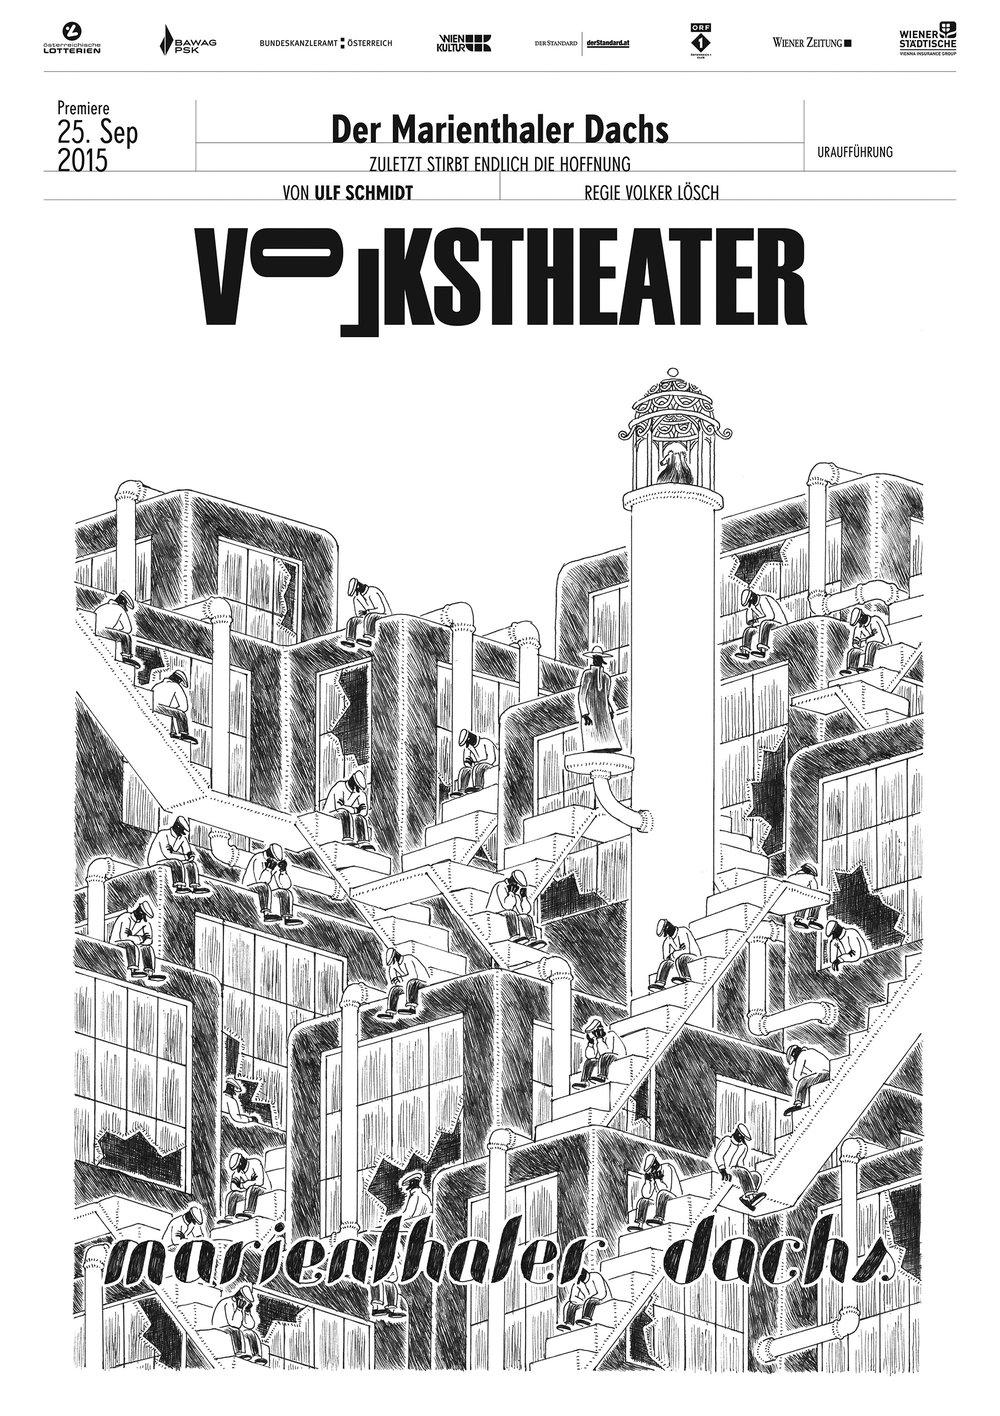 Volkstheater_Poster.jpg